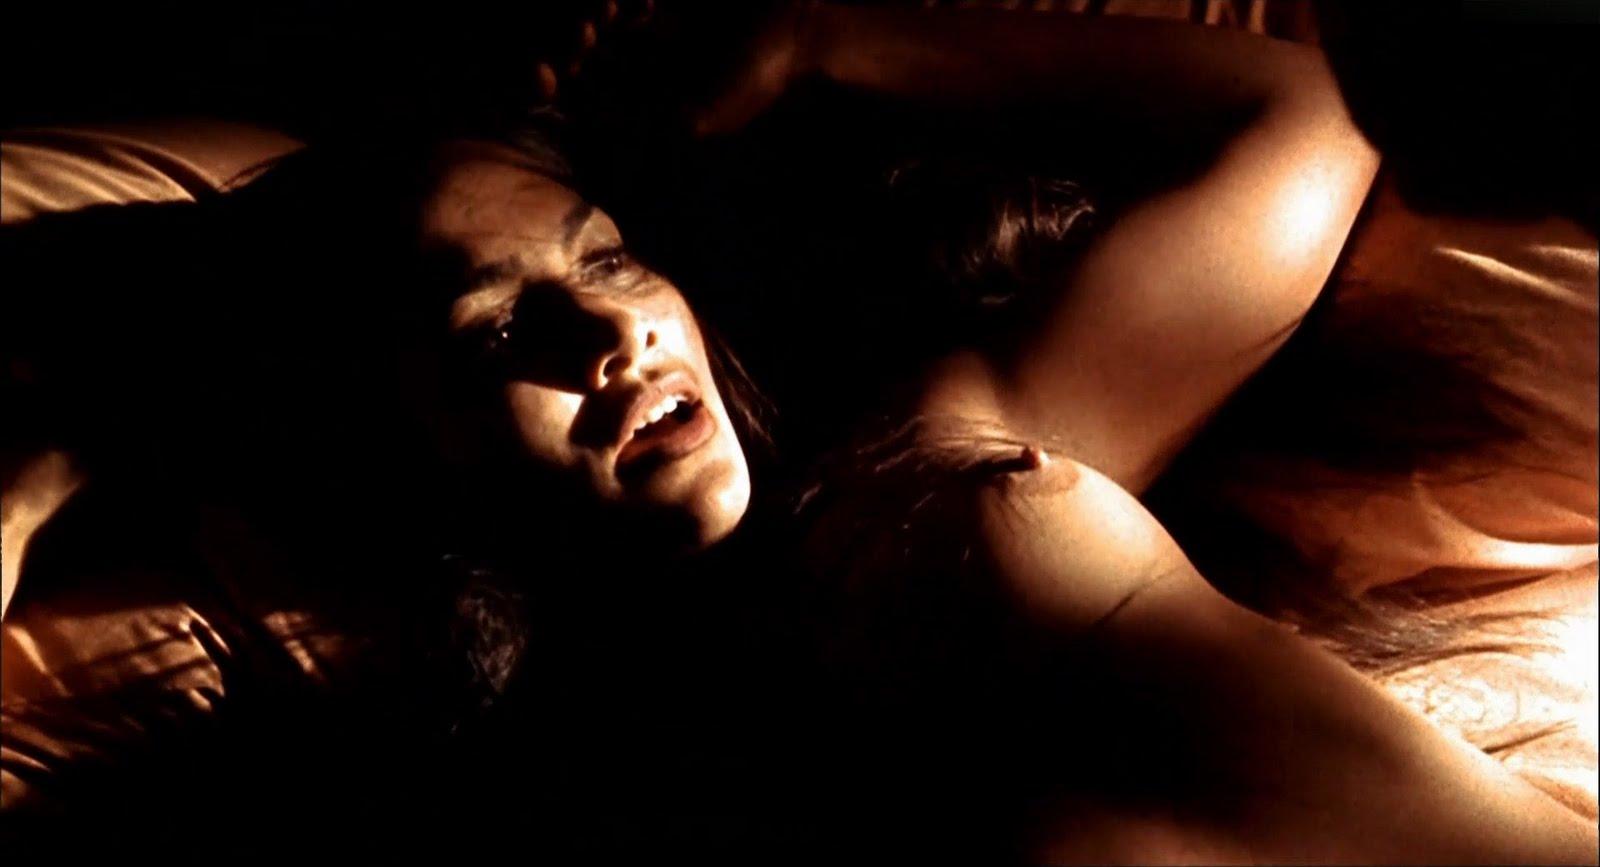 Hot jennifer lopez nude